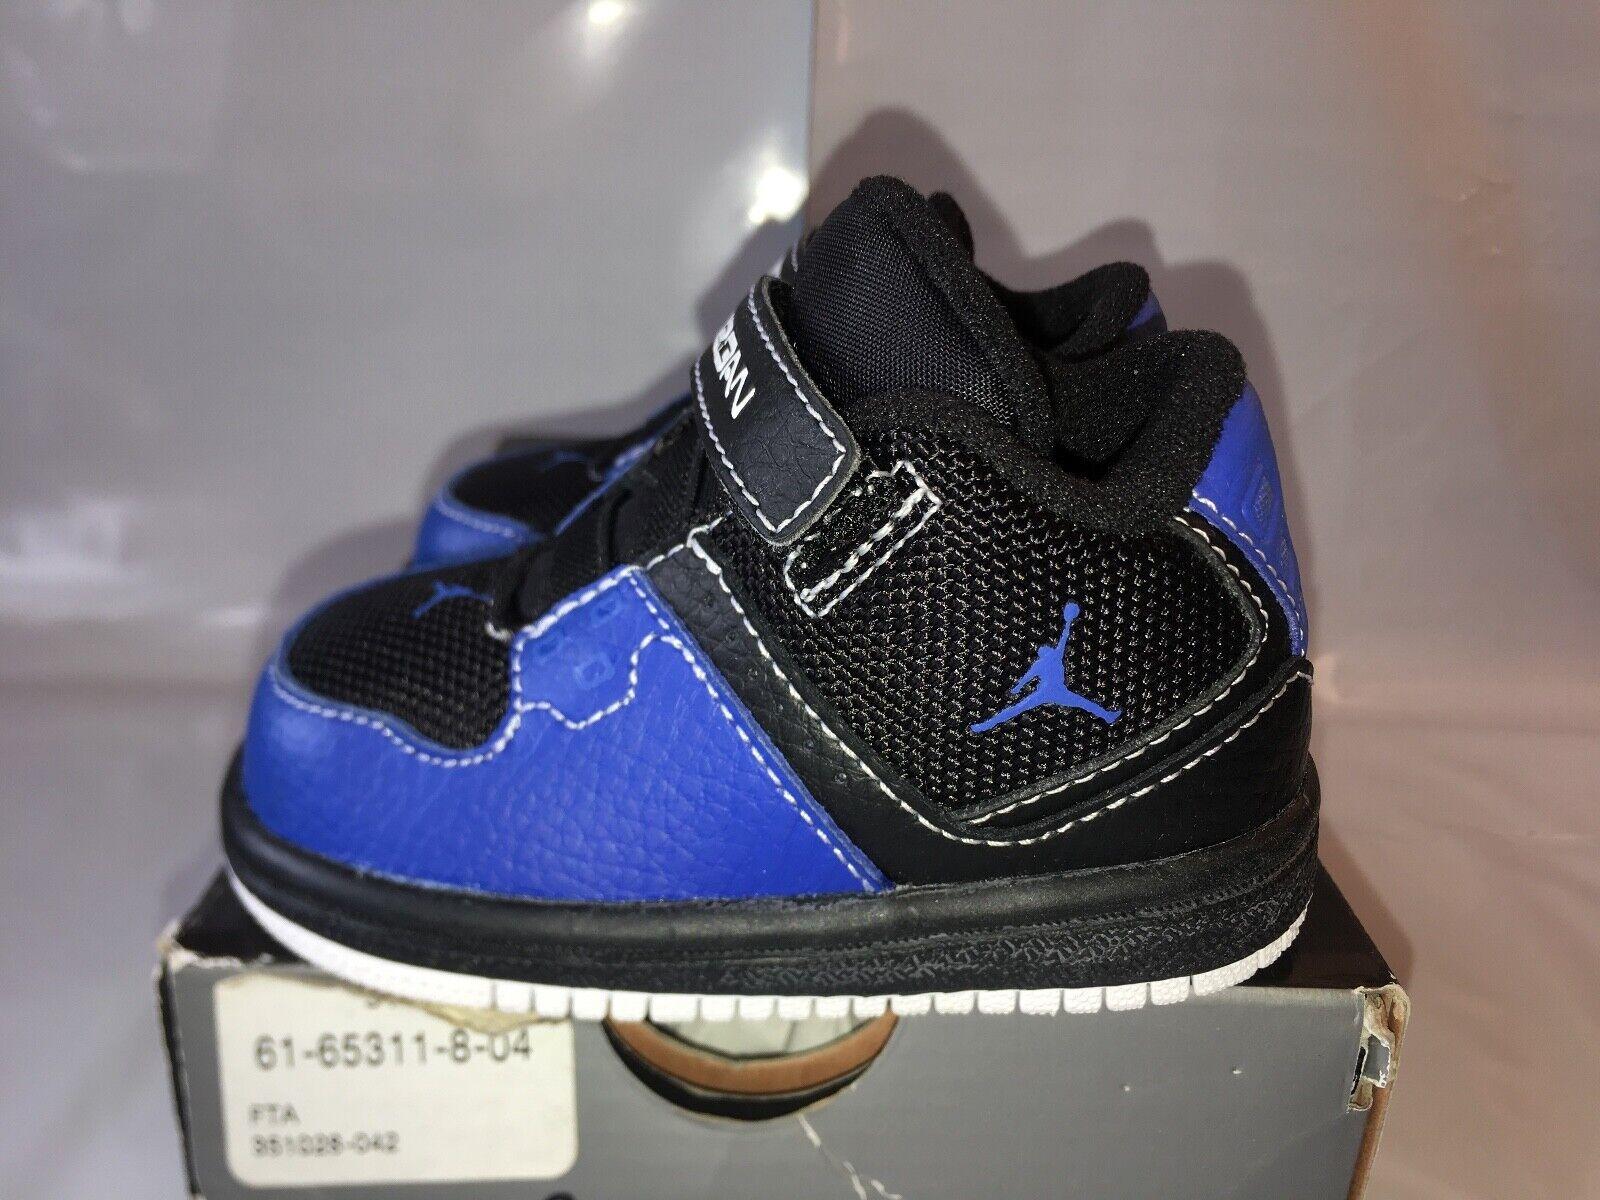 NEW Nike Air Jordan 1 Flight Low Baby Toddler 3c 3 Black Royal Blue 351028-042